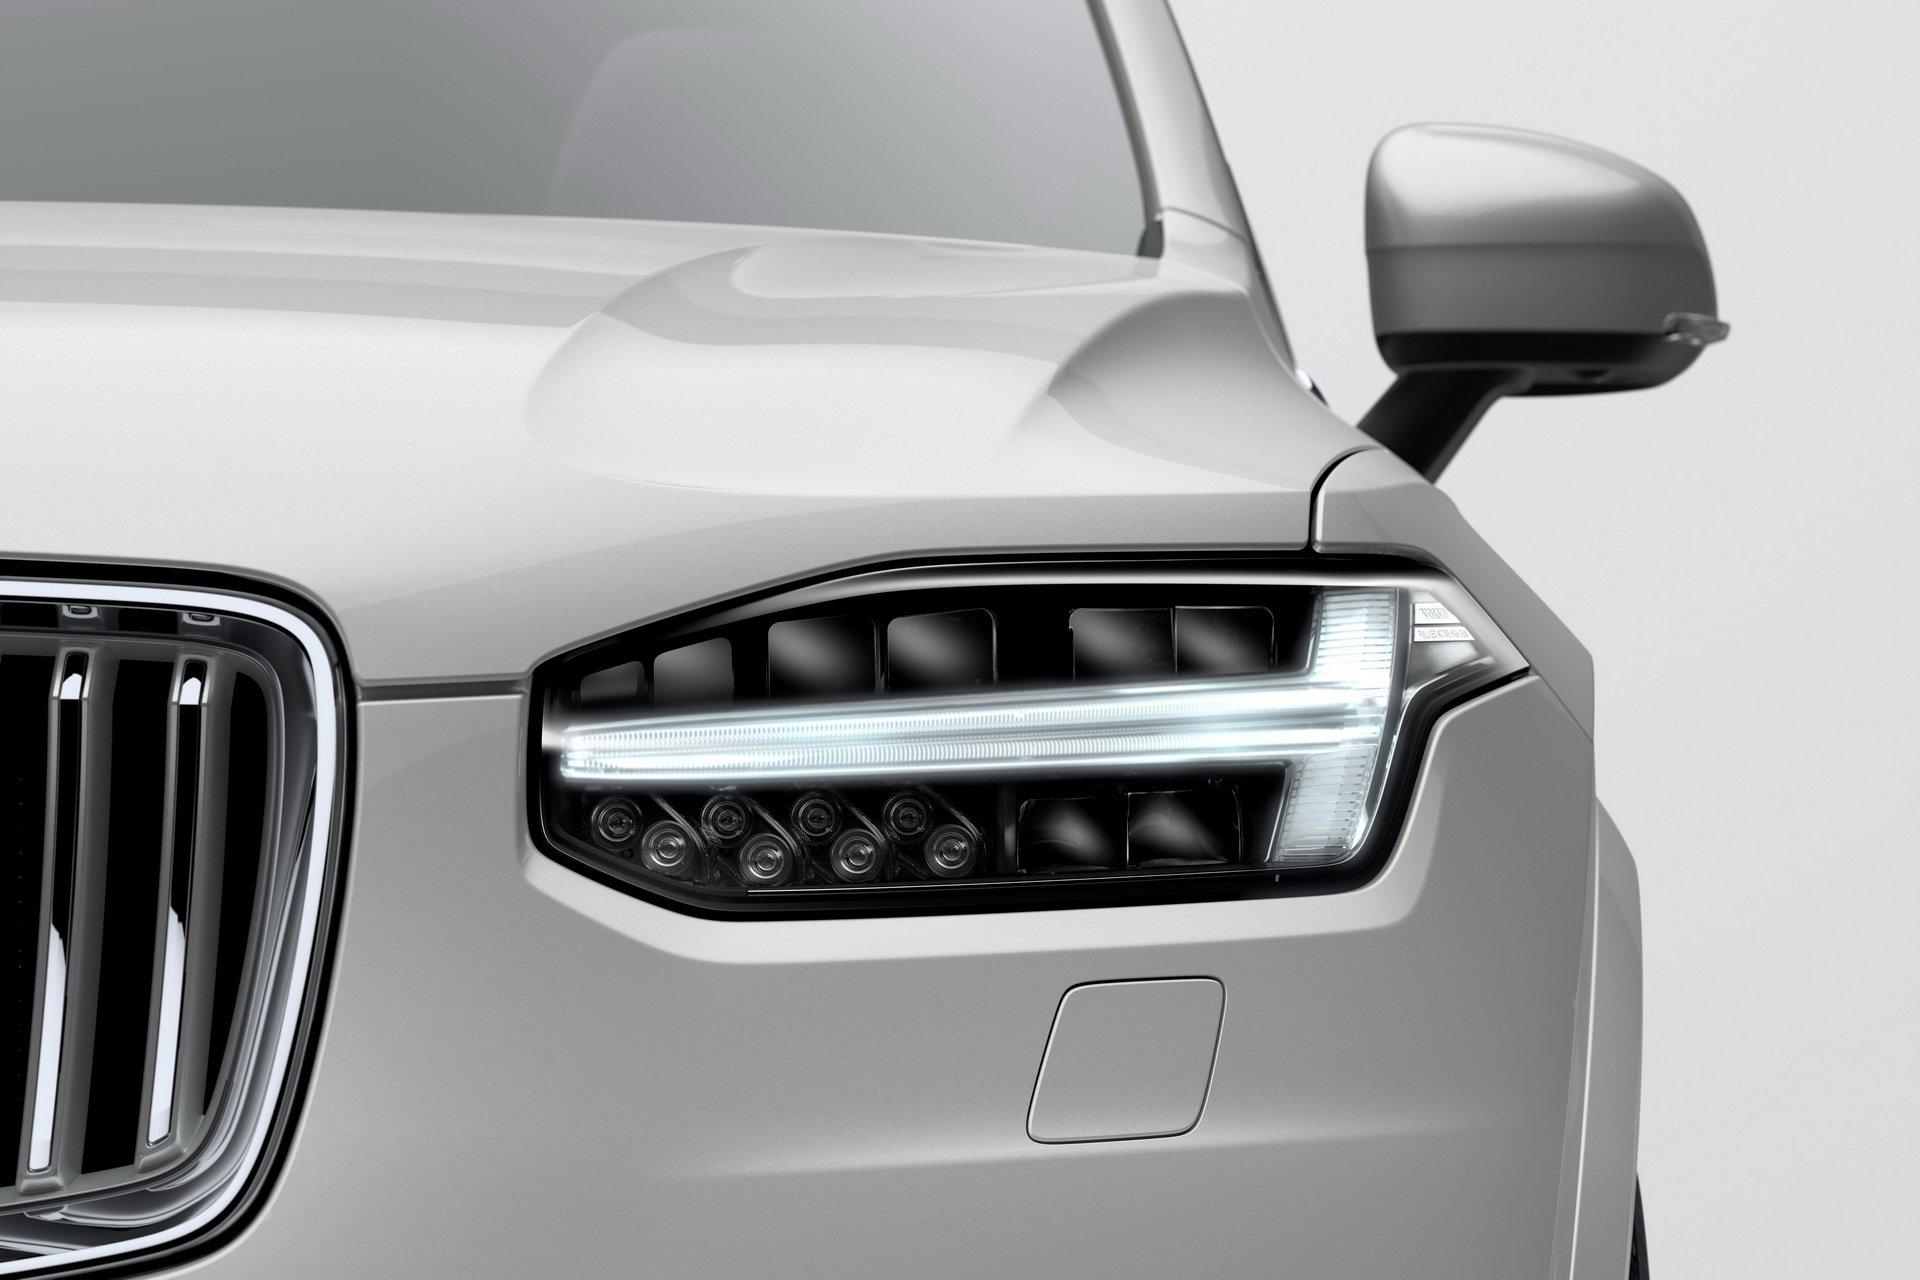 Concurentul lui BMW X5 a primit un facelift major. Uite cum arata versiunea mult imbunatatita